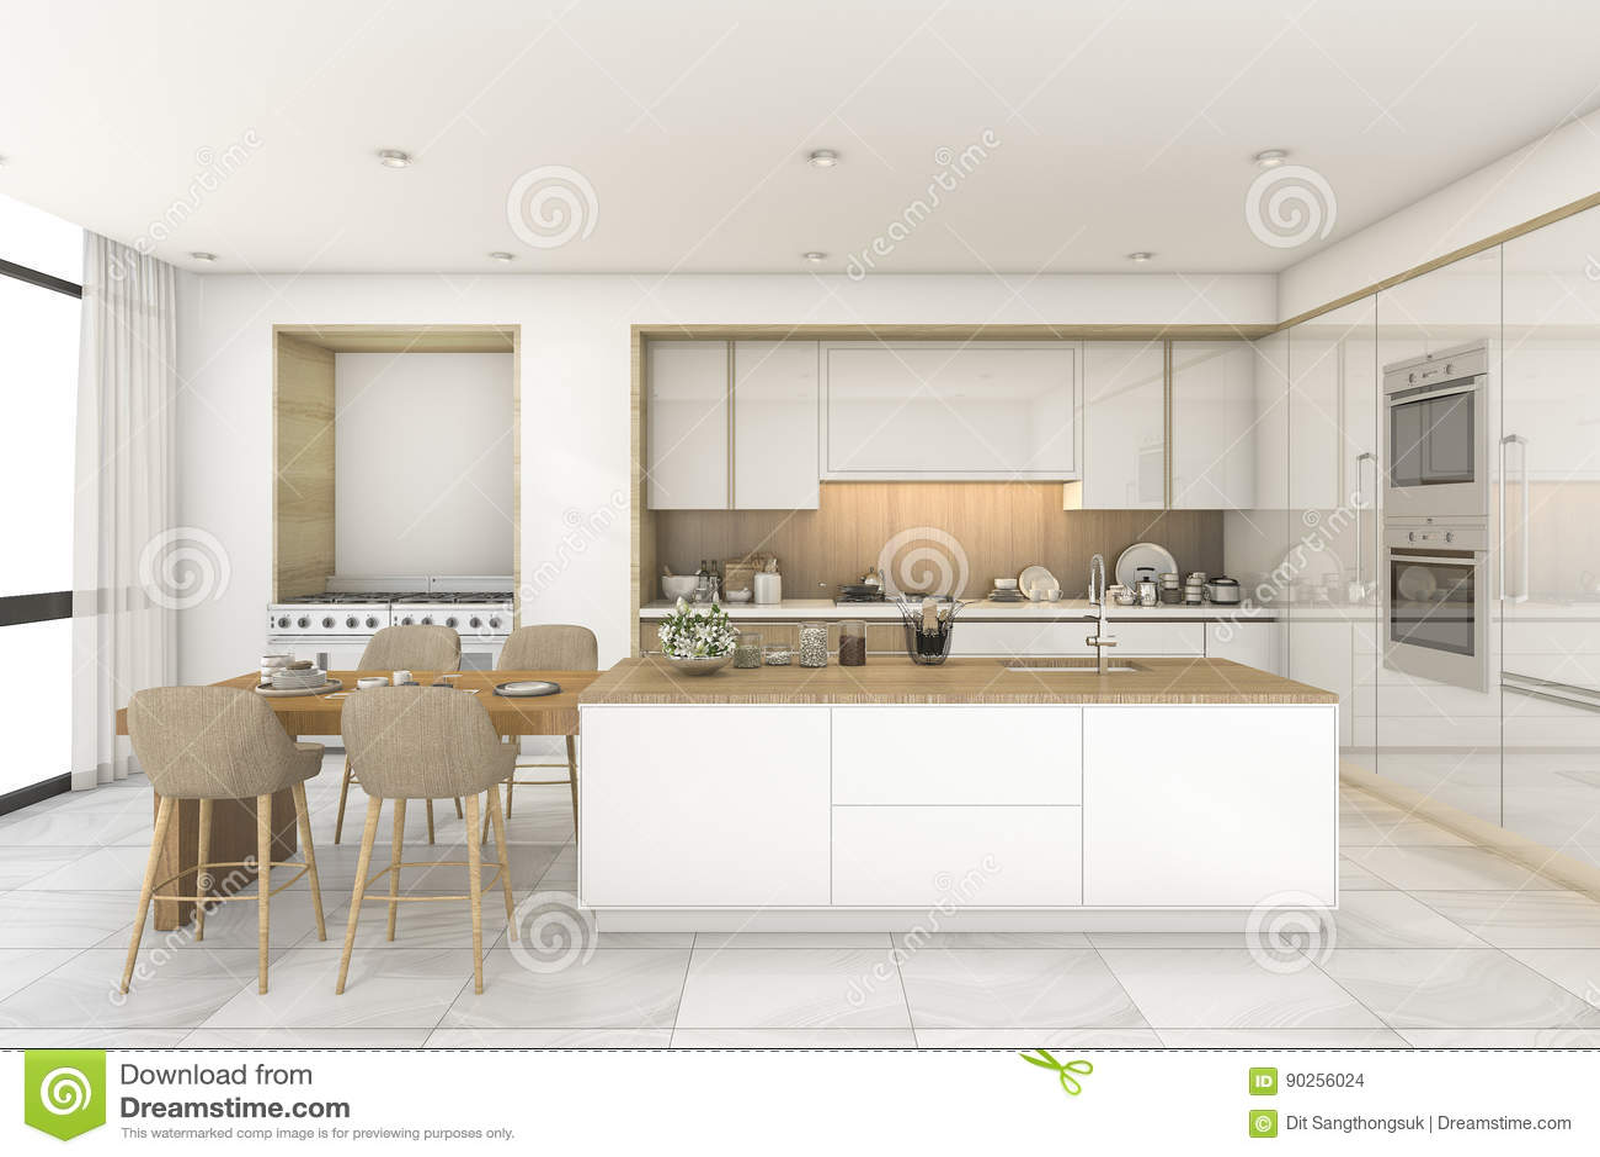 3d che rende cucina e sala da pranzo scandinave con le mattonelle